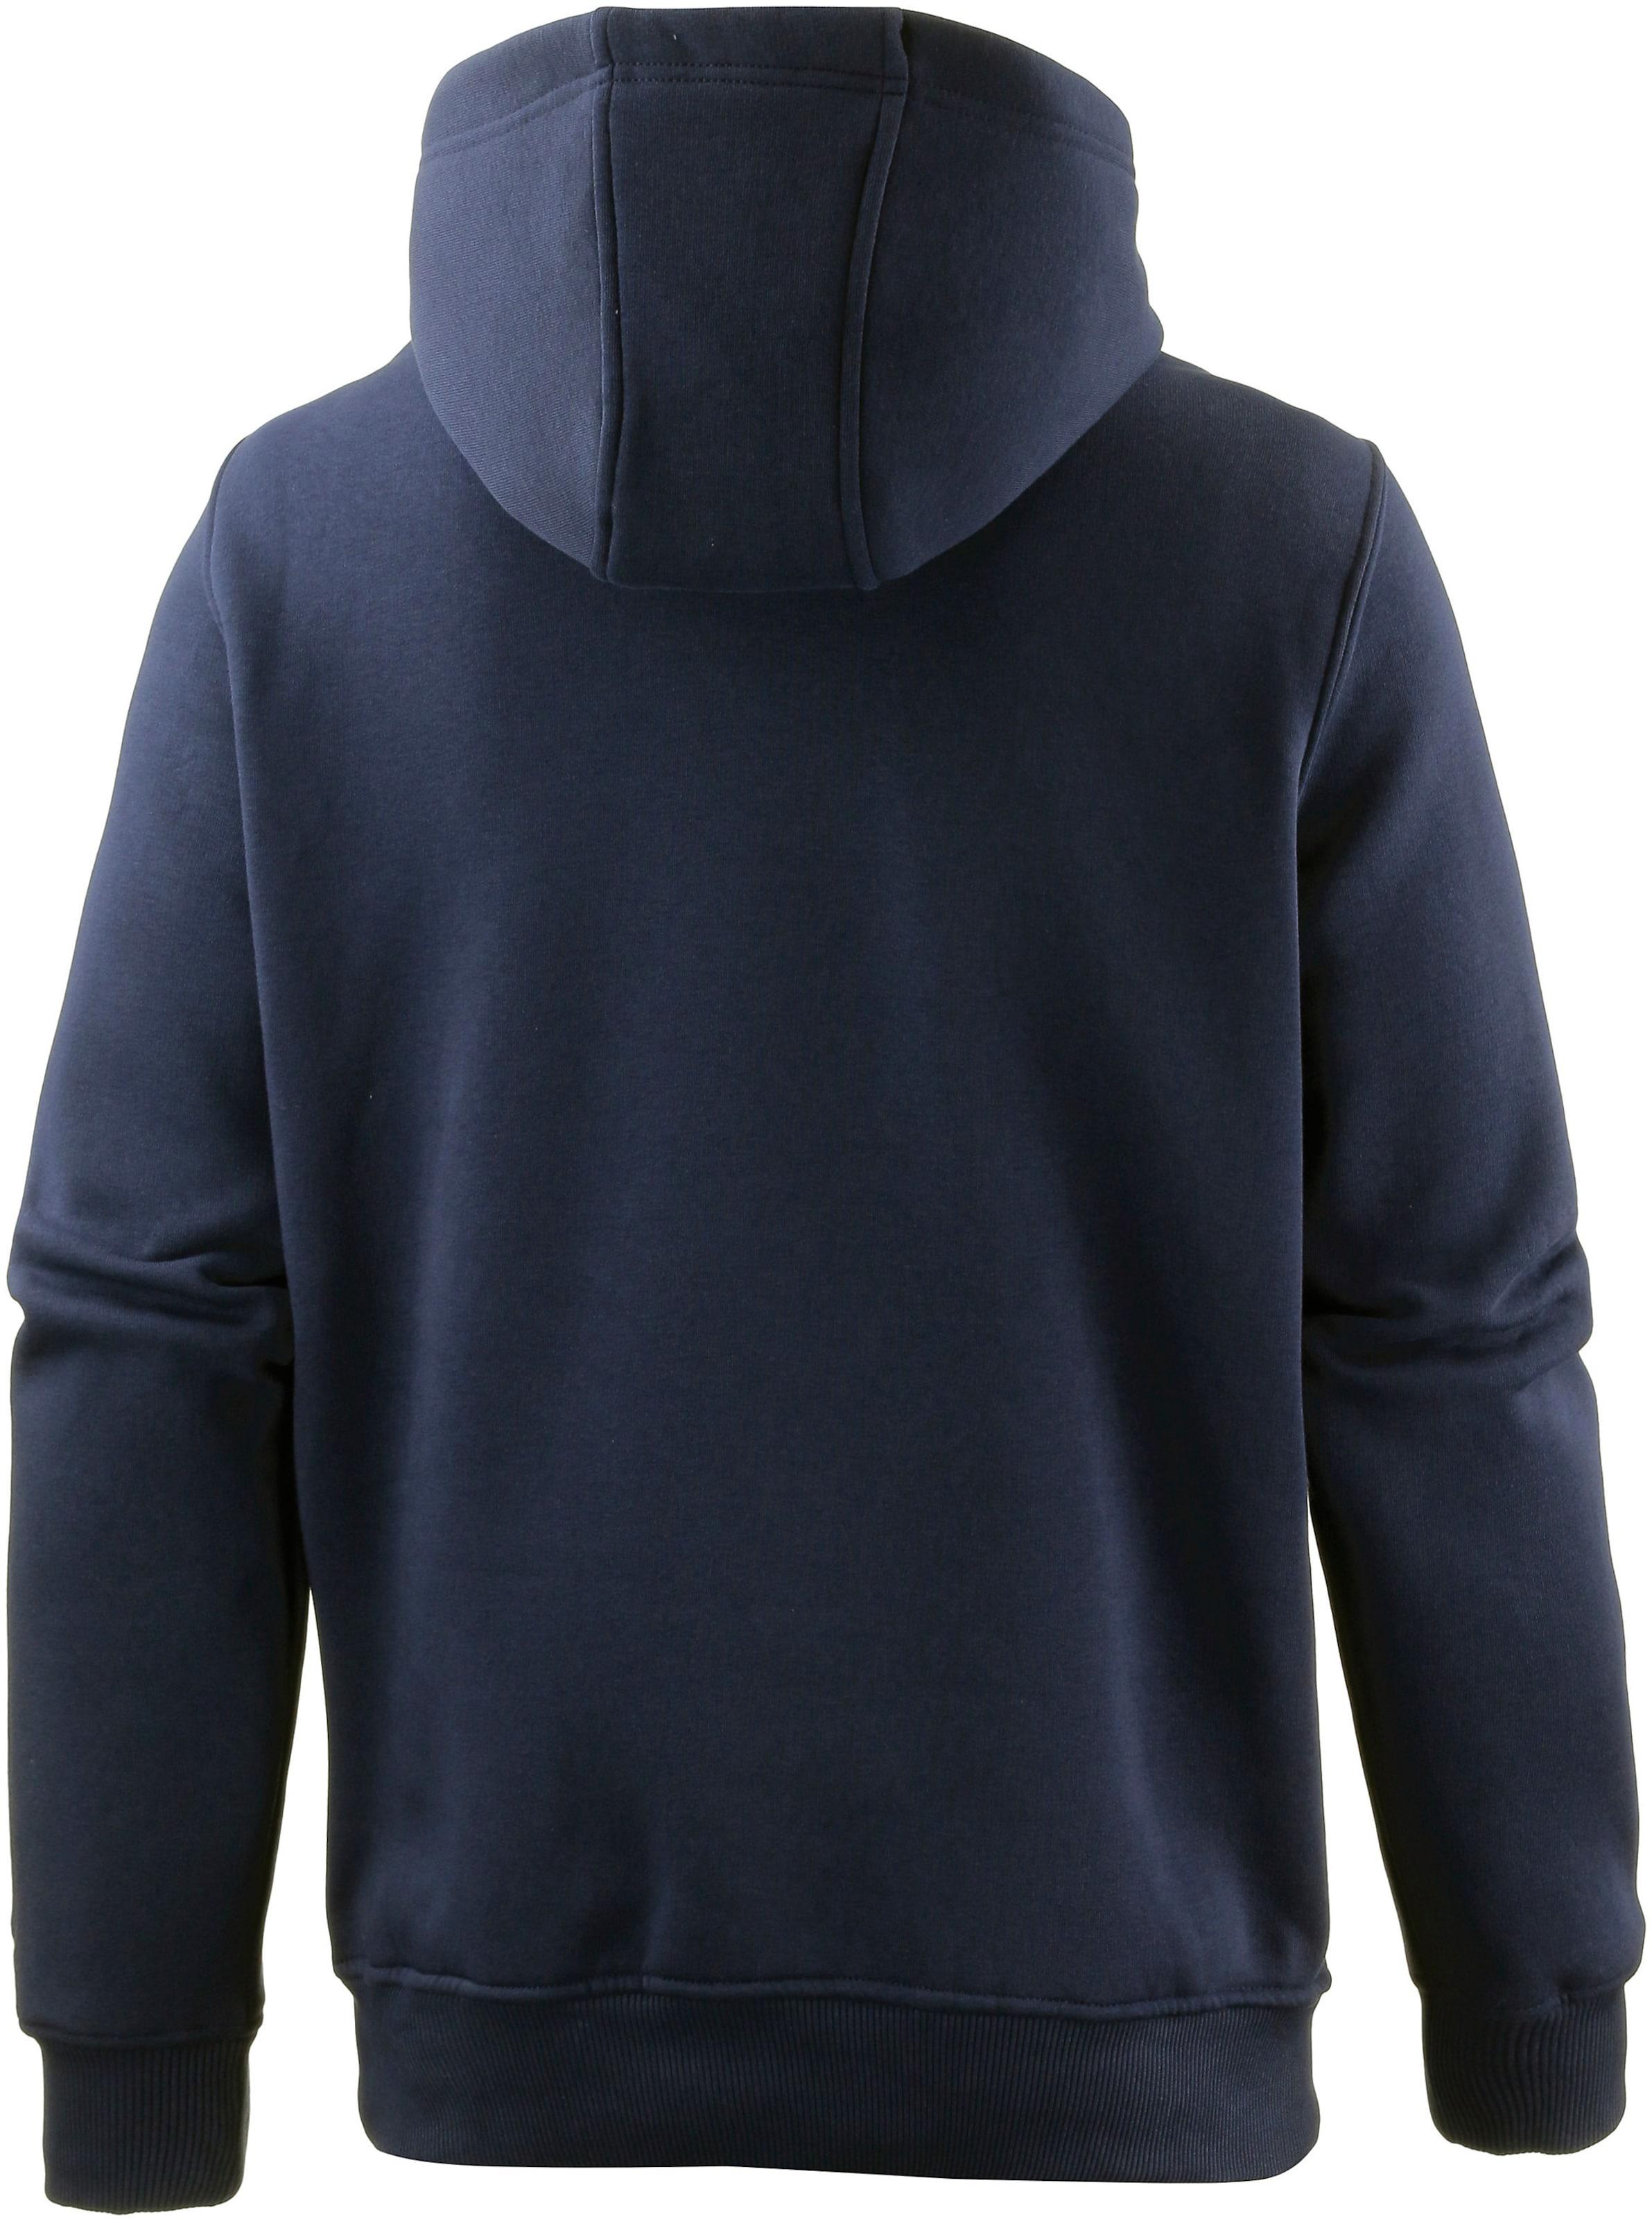 Bleu En New Era shirt Nuit Sweat 'seattle Seahawks' uJ5TKc1F3l